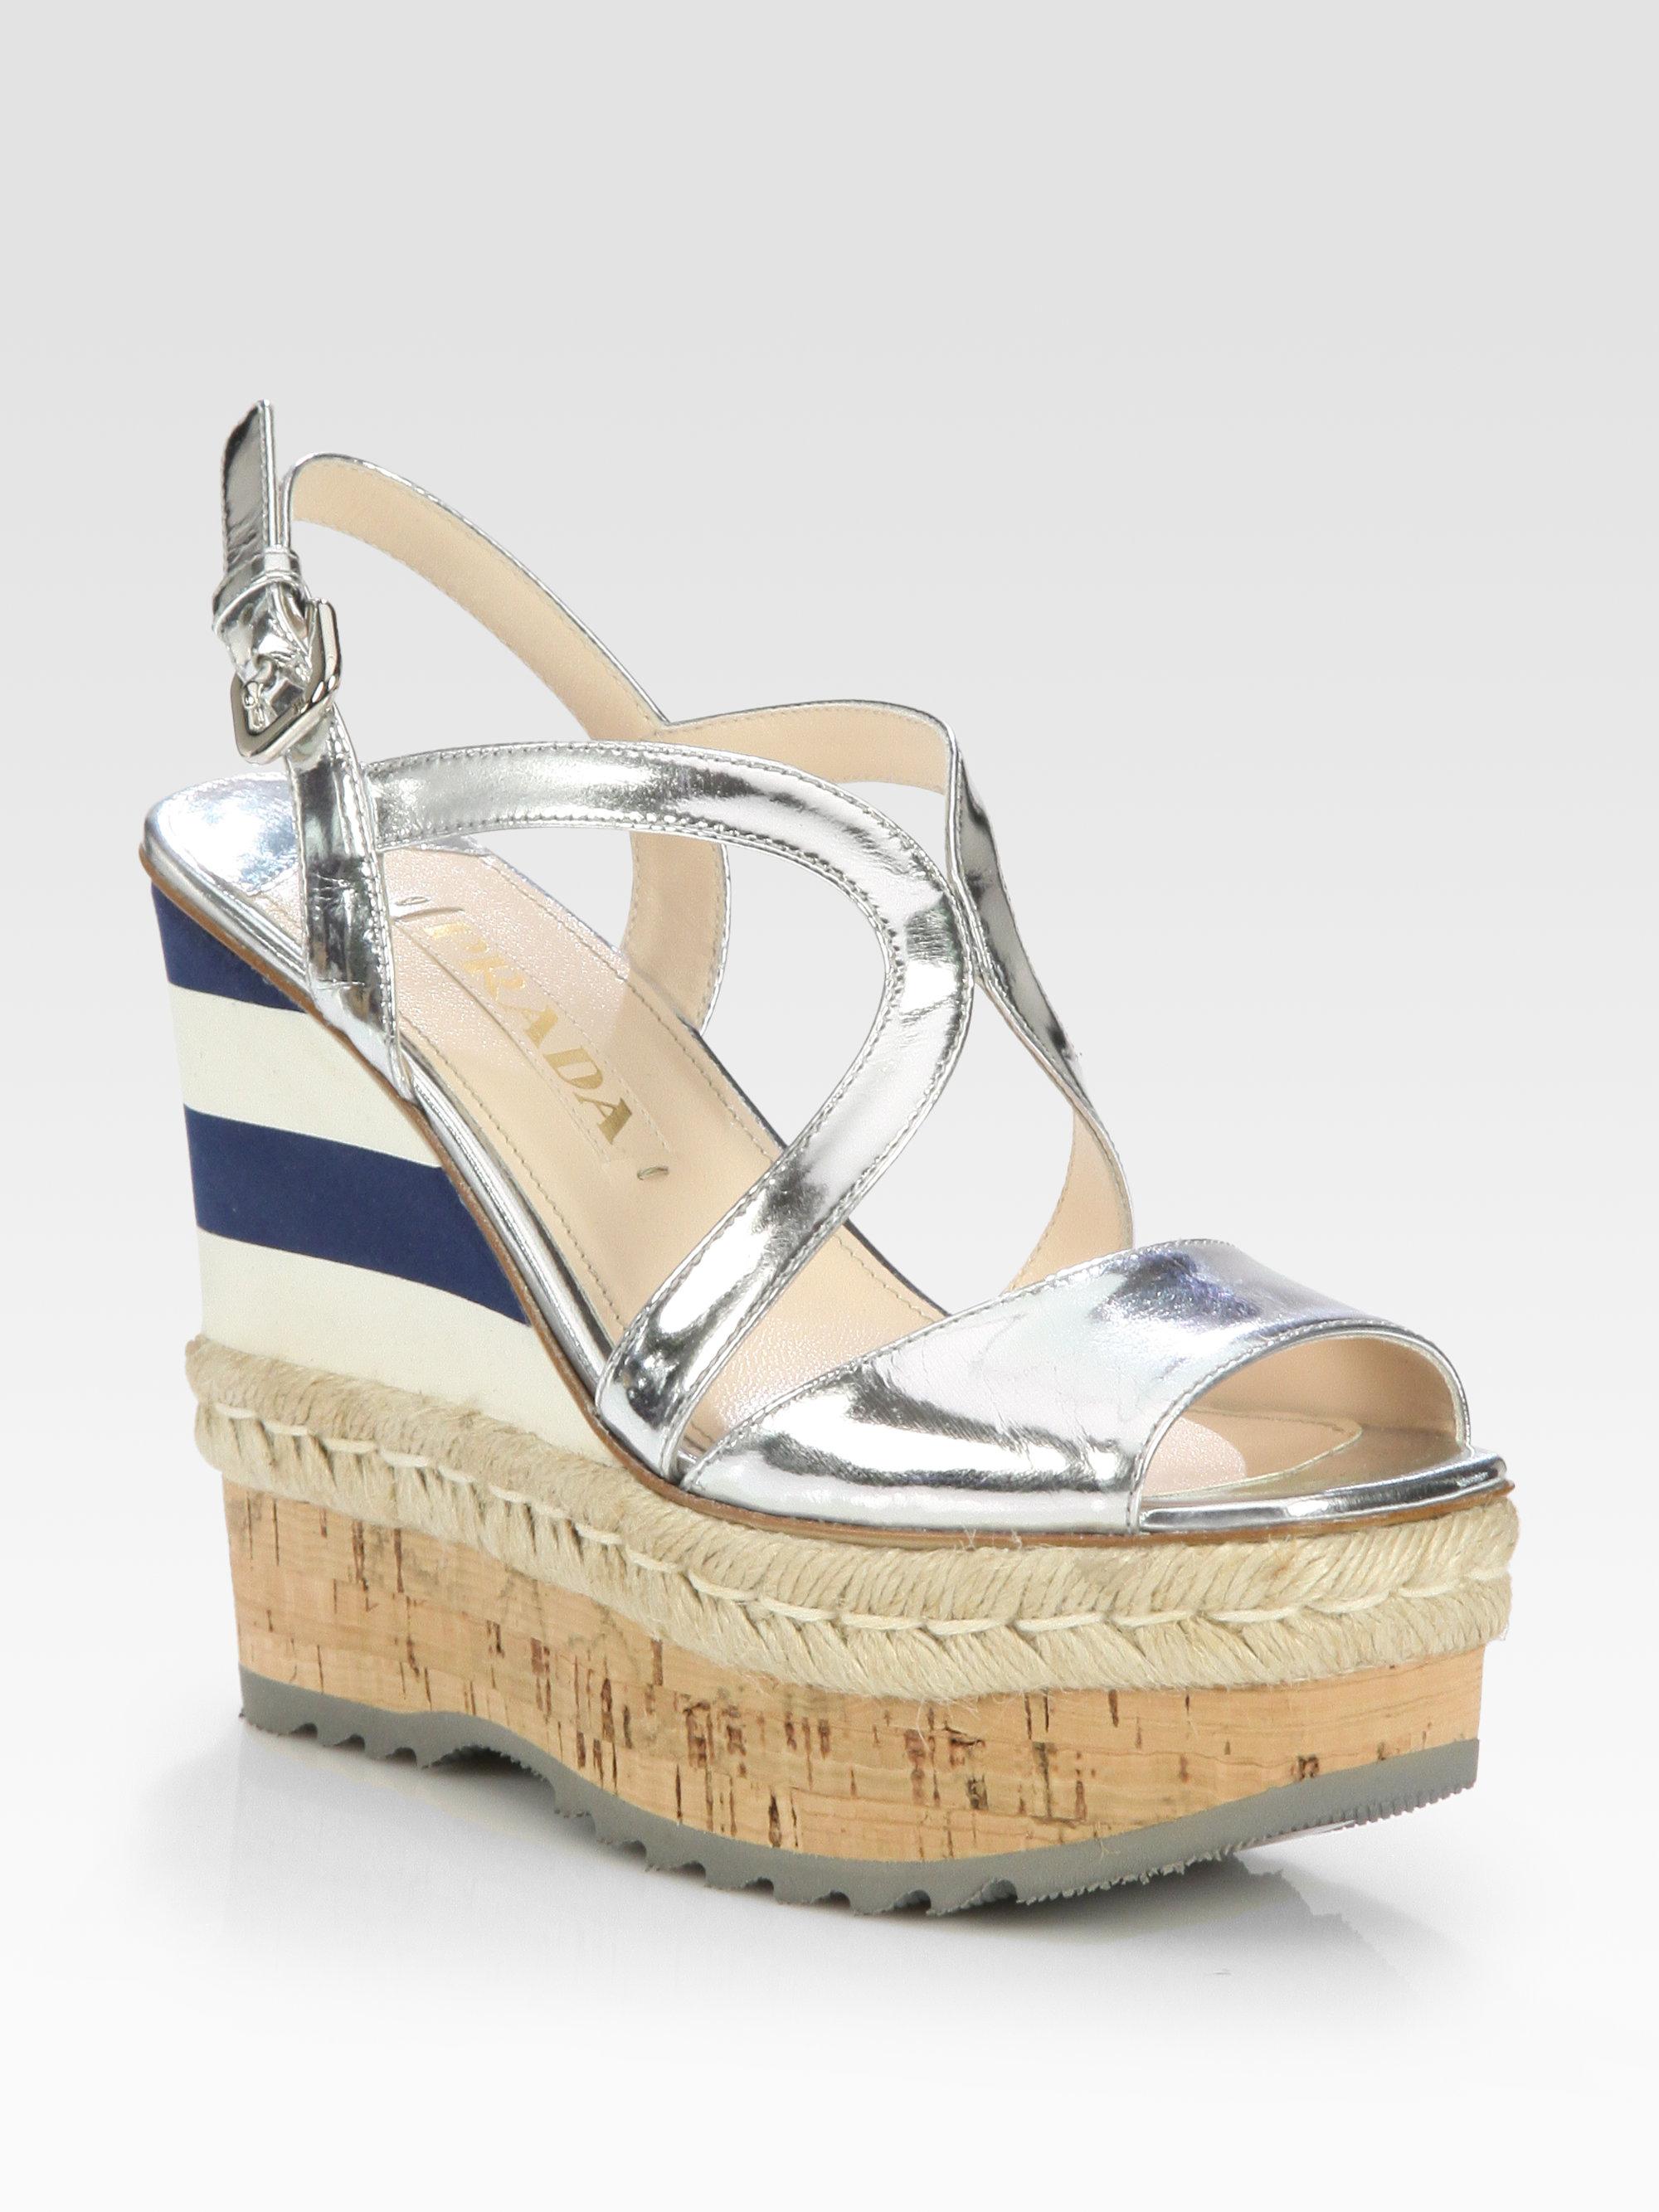 77b44de7bbf Lyst - Prada Metallic Leather Espadrille Wedge Sandals in Metallic